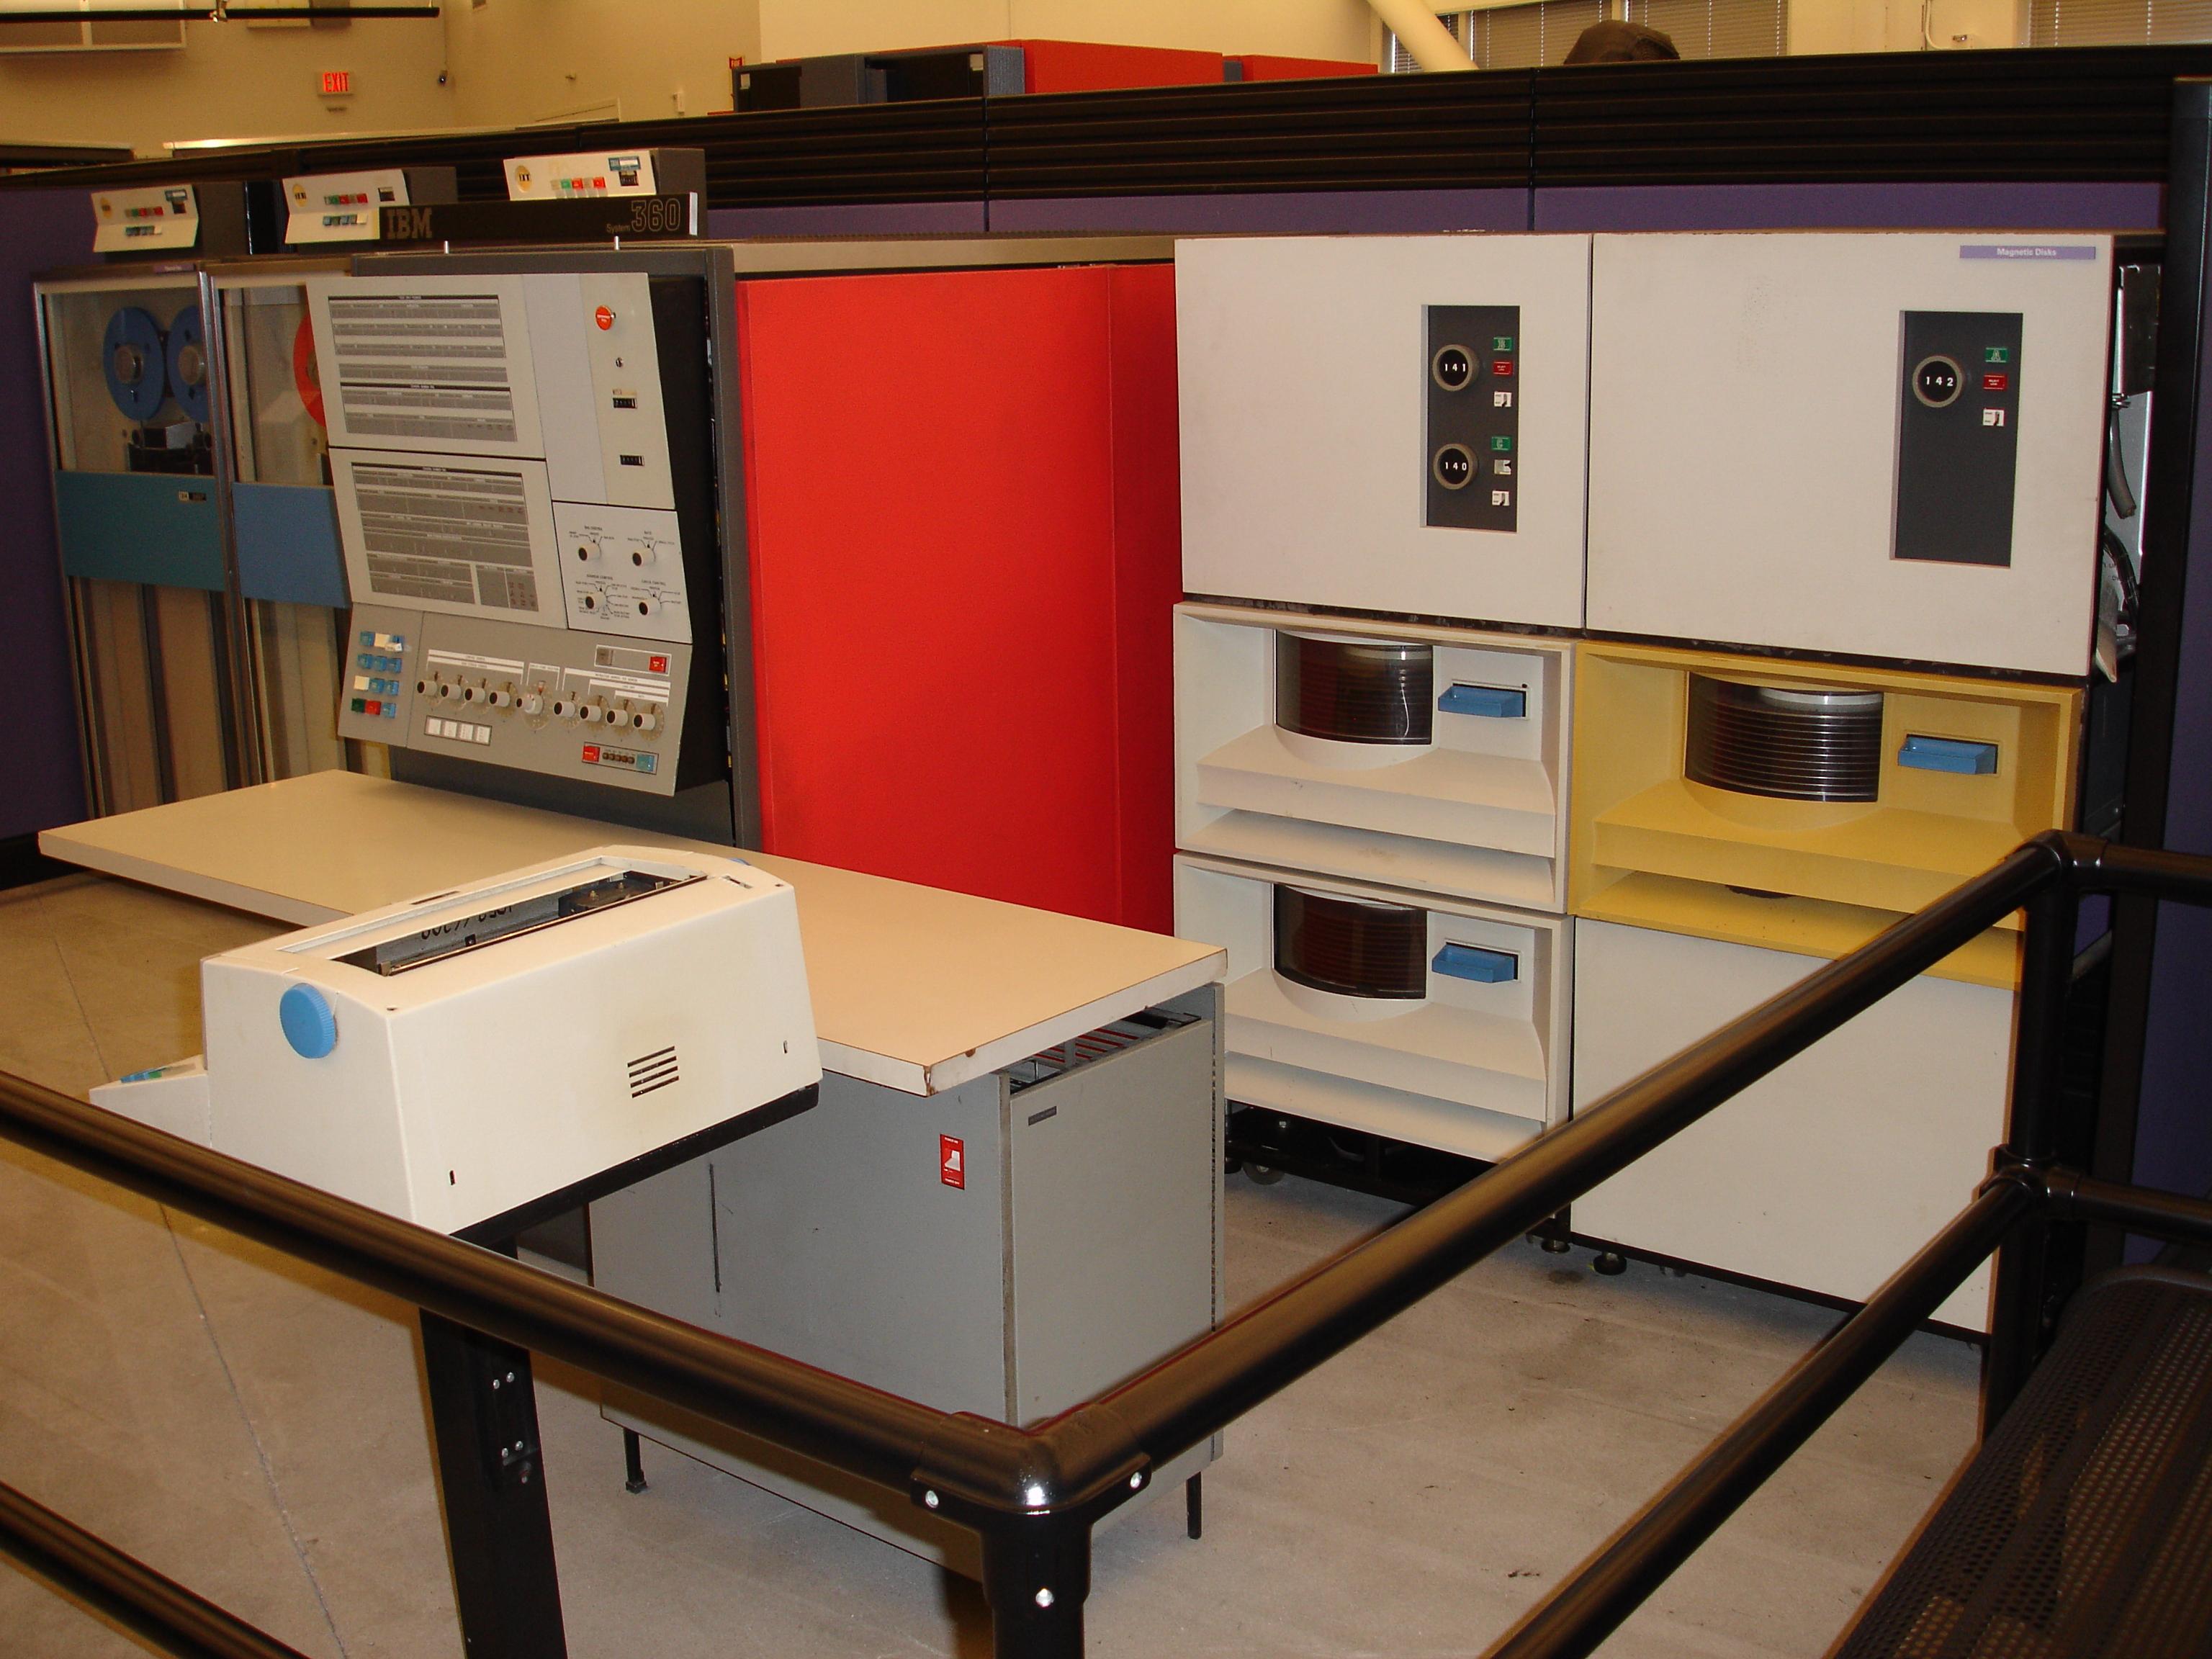 IBM_System360_Model_30.jpg